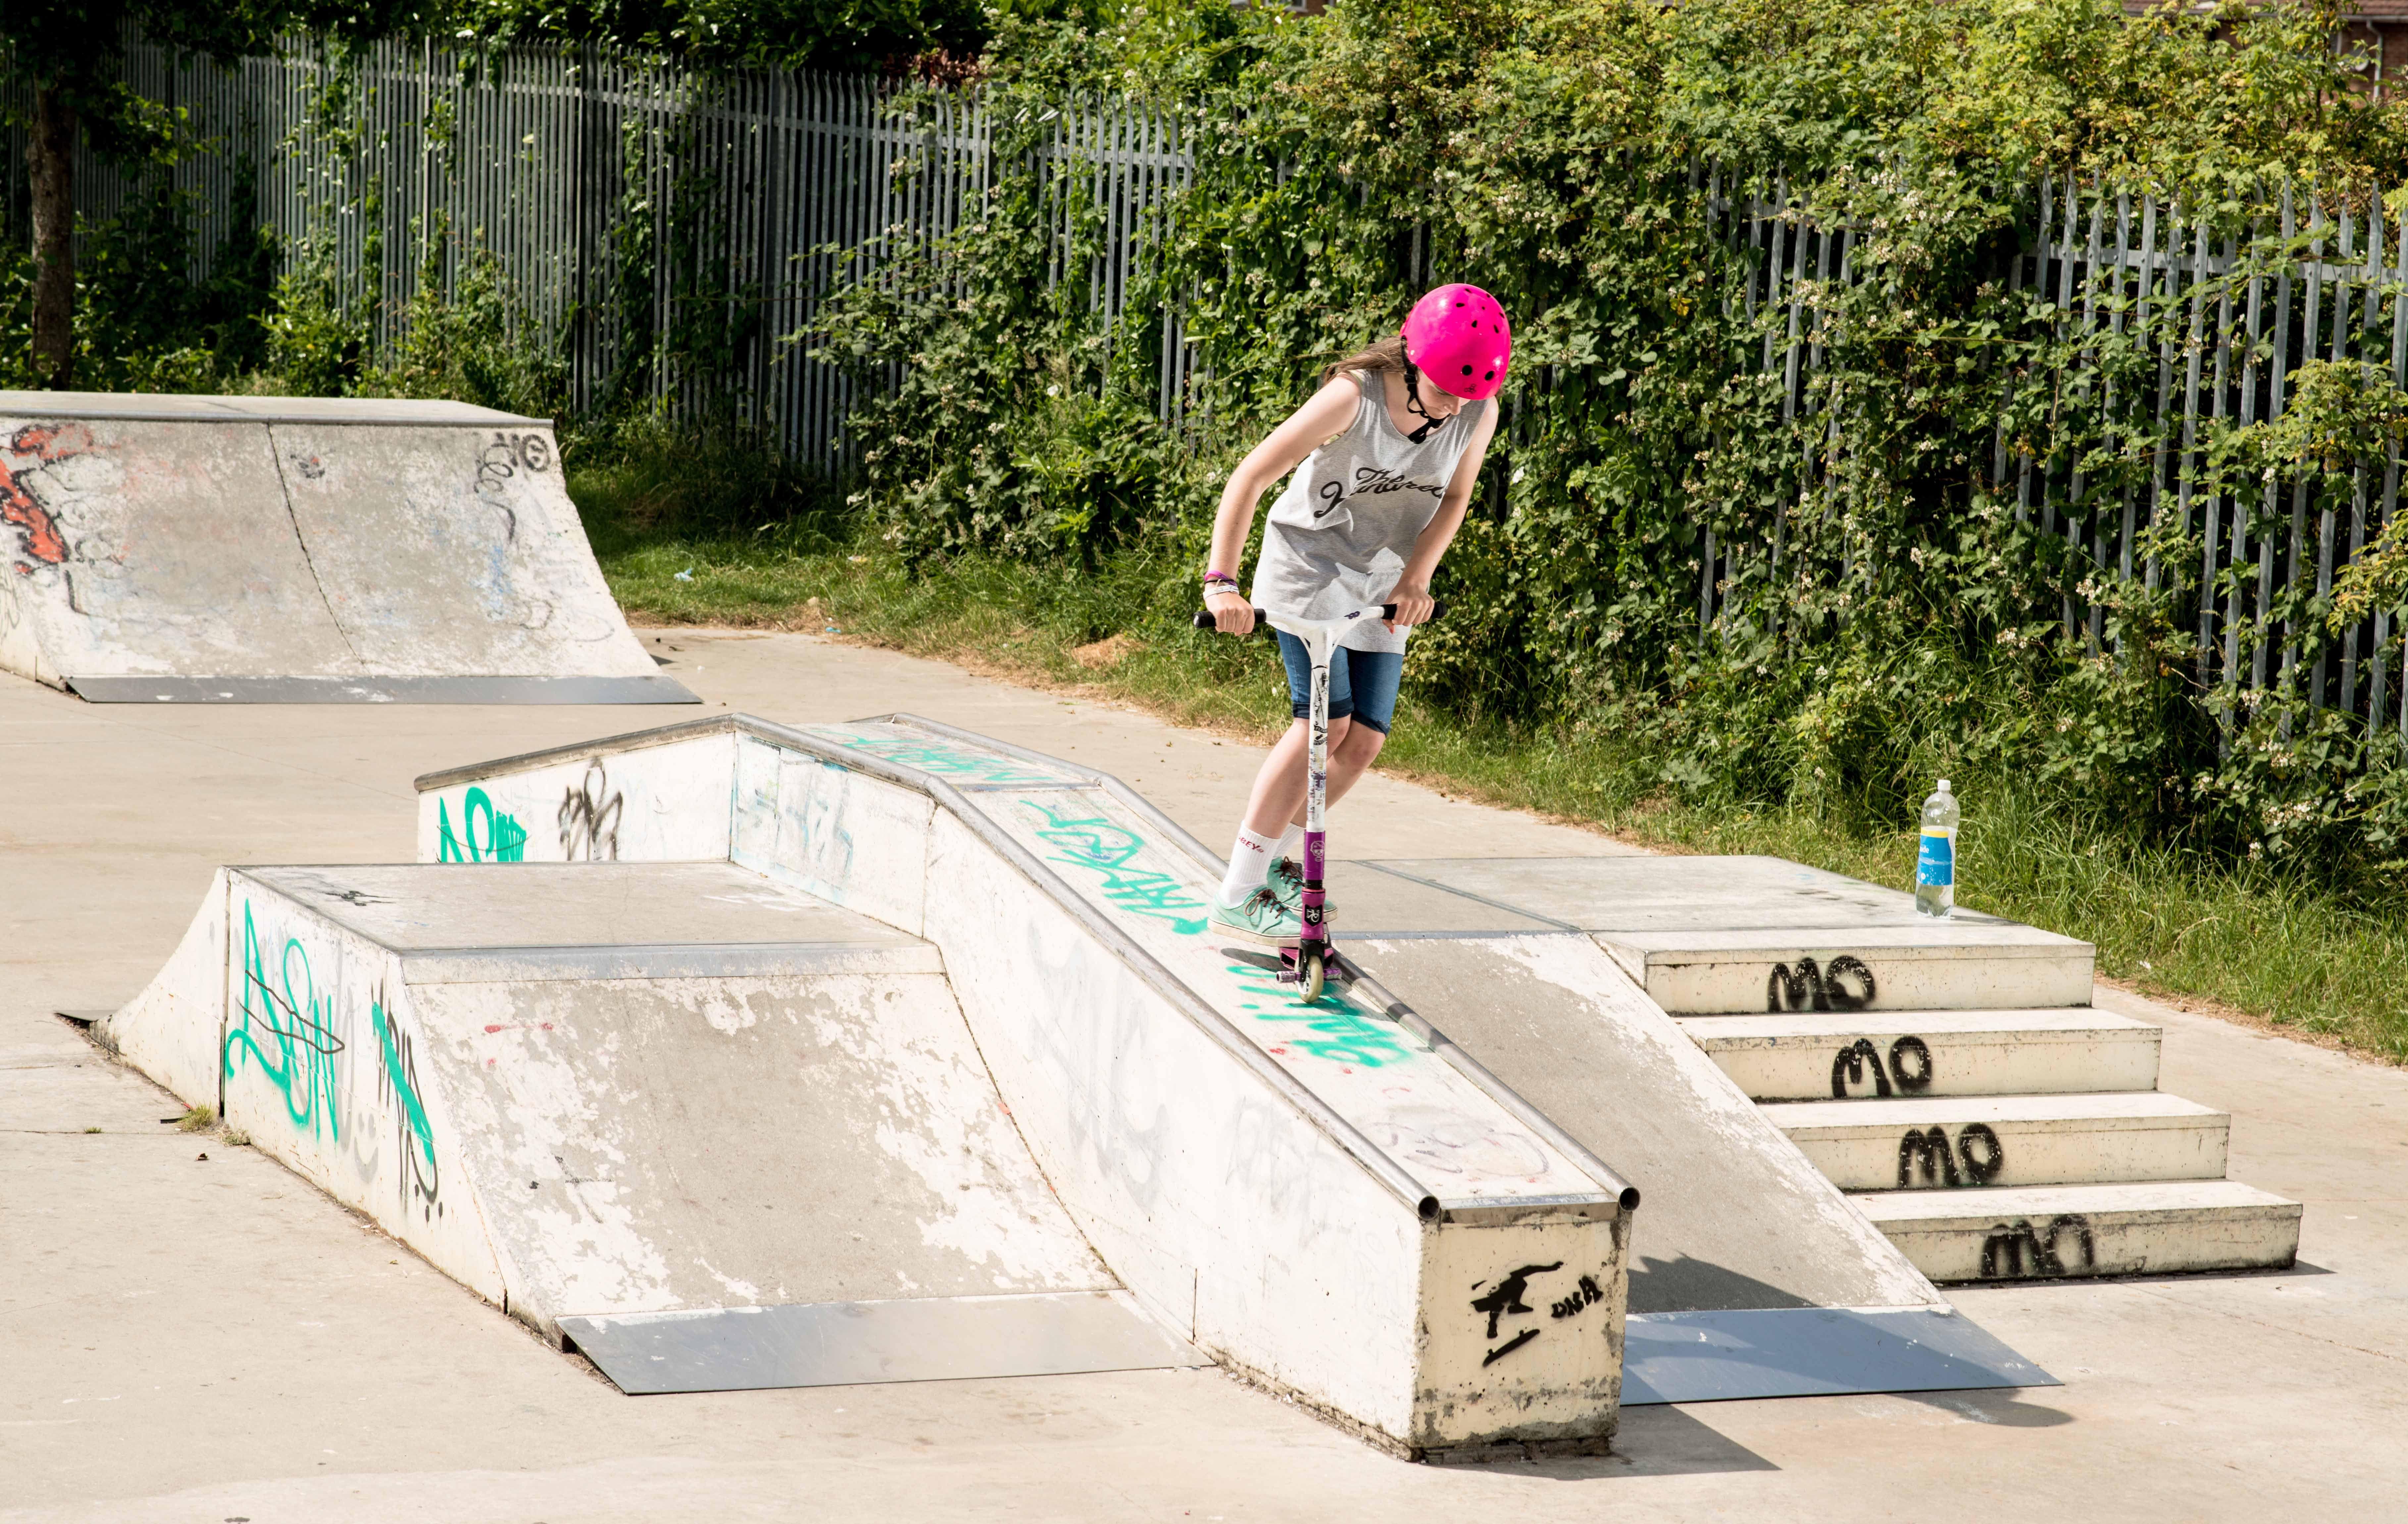 Grit girl rider Maddie Swain